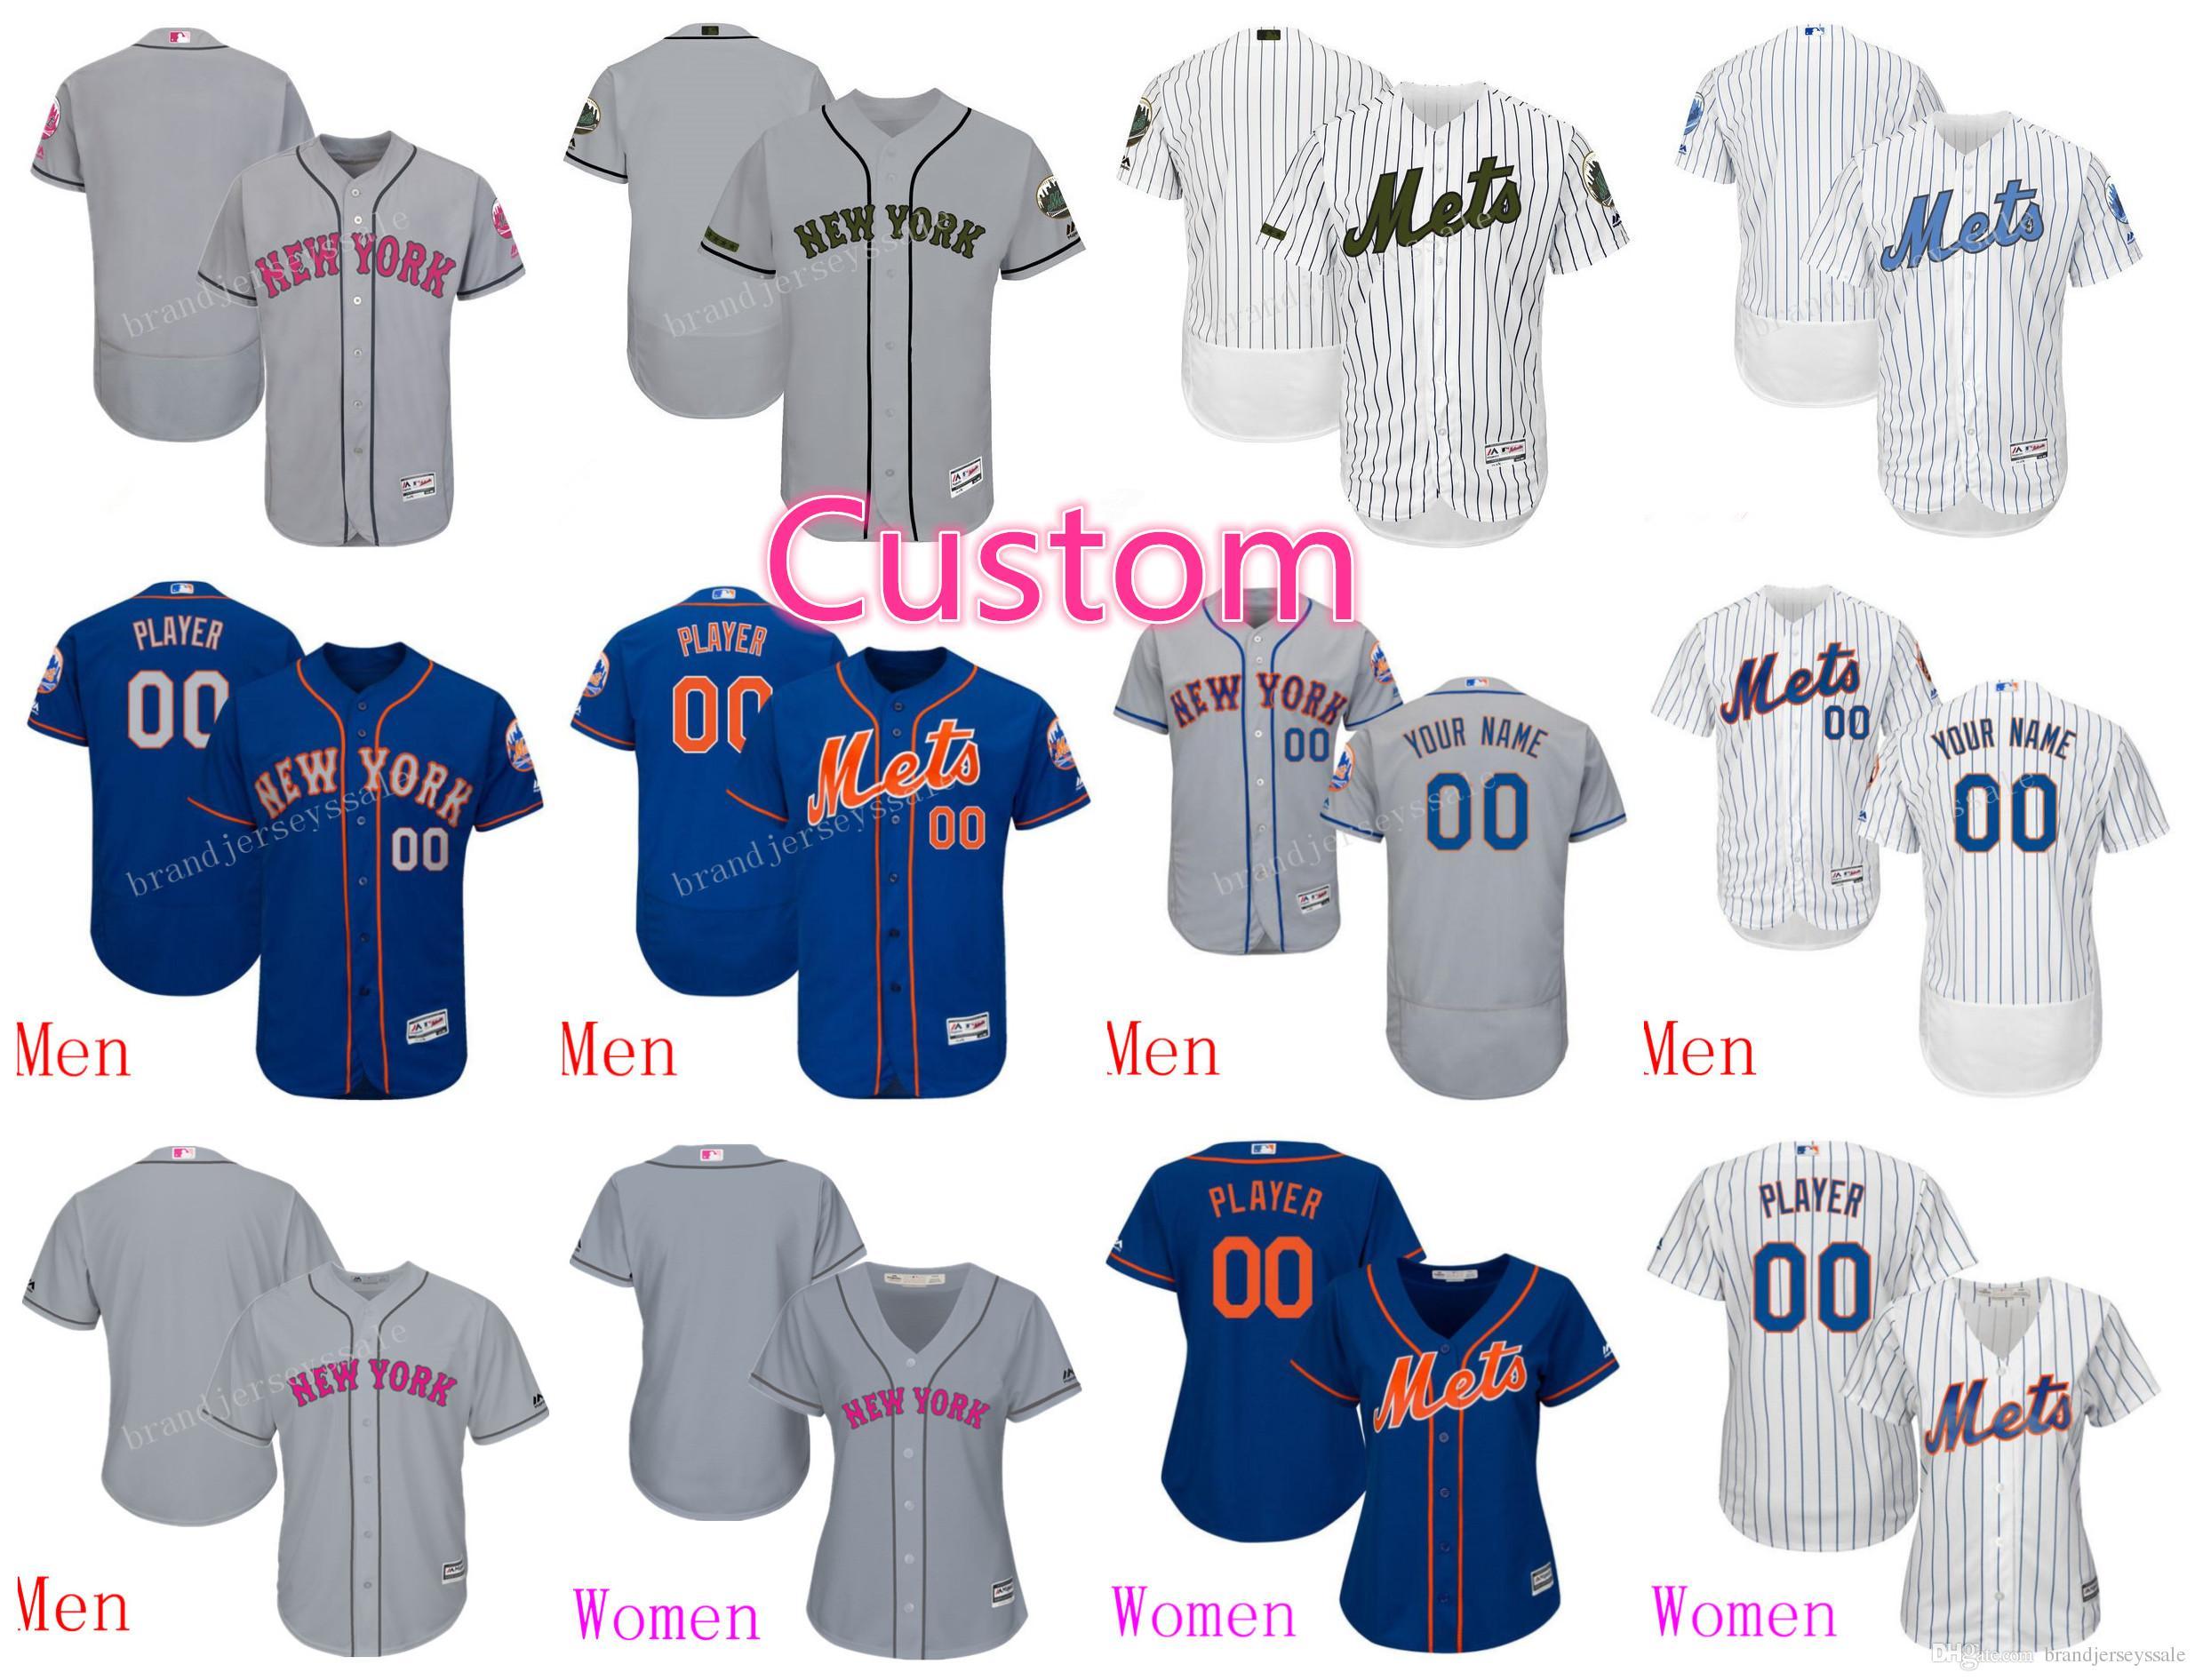 sale retailer c2fca af083 netherlands new york mets customized gray jersey 03917 d6ee9